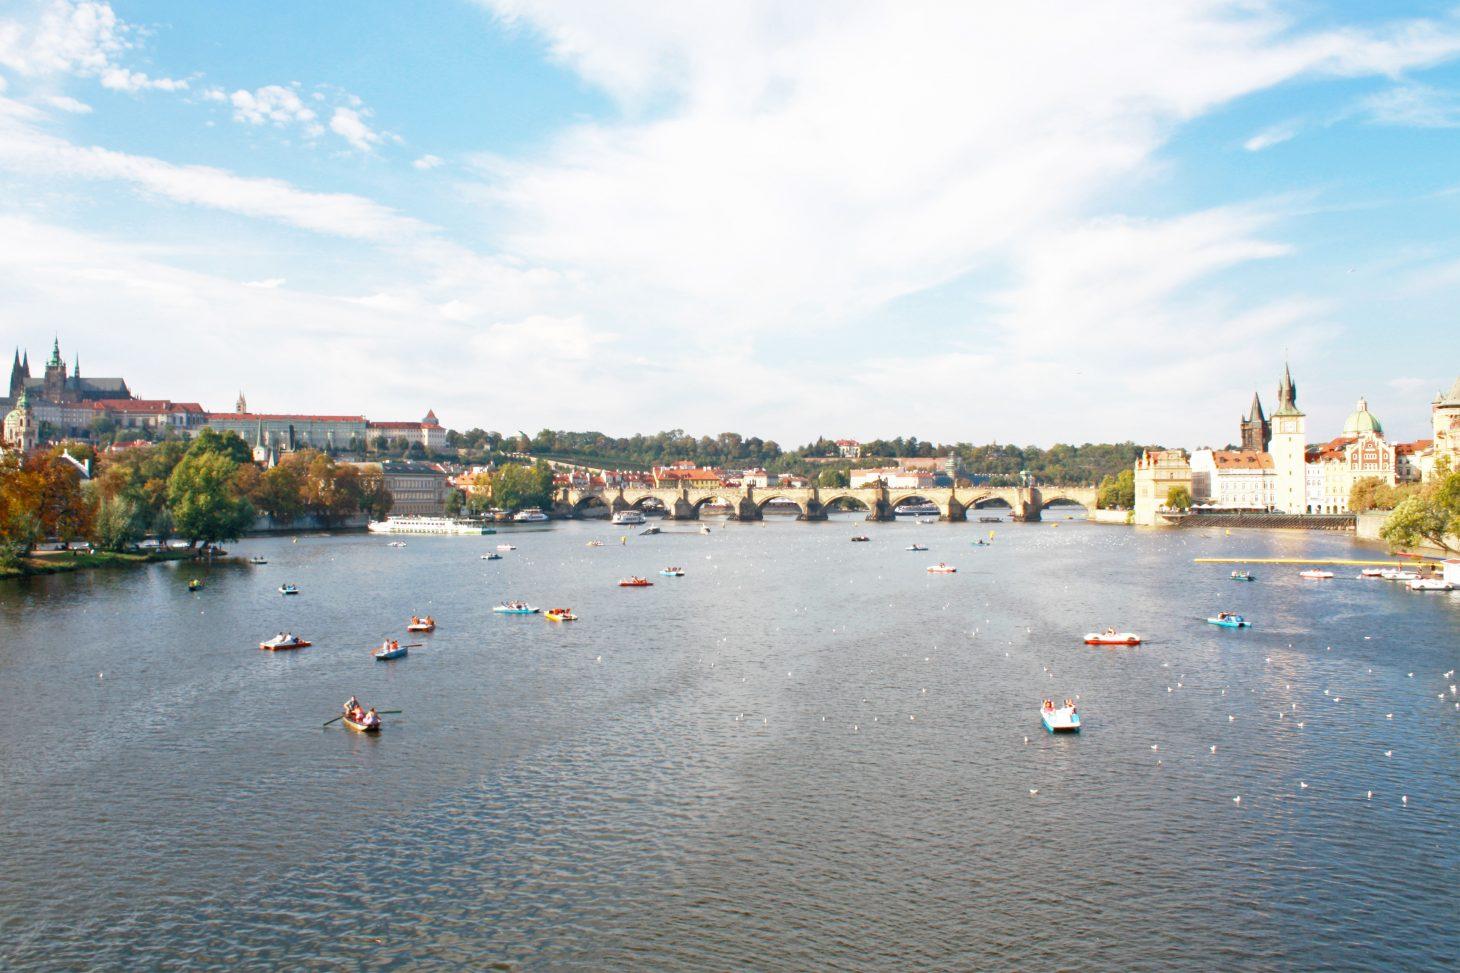 Charles bridge over Vltava and Prague castle